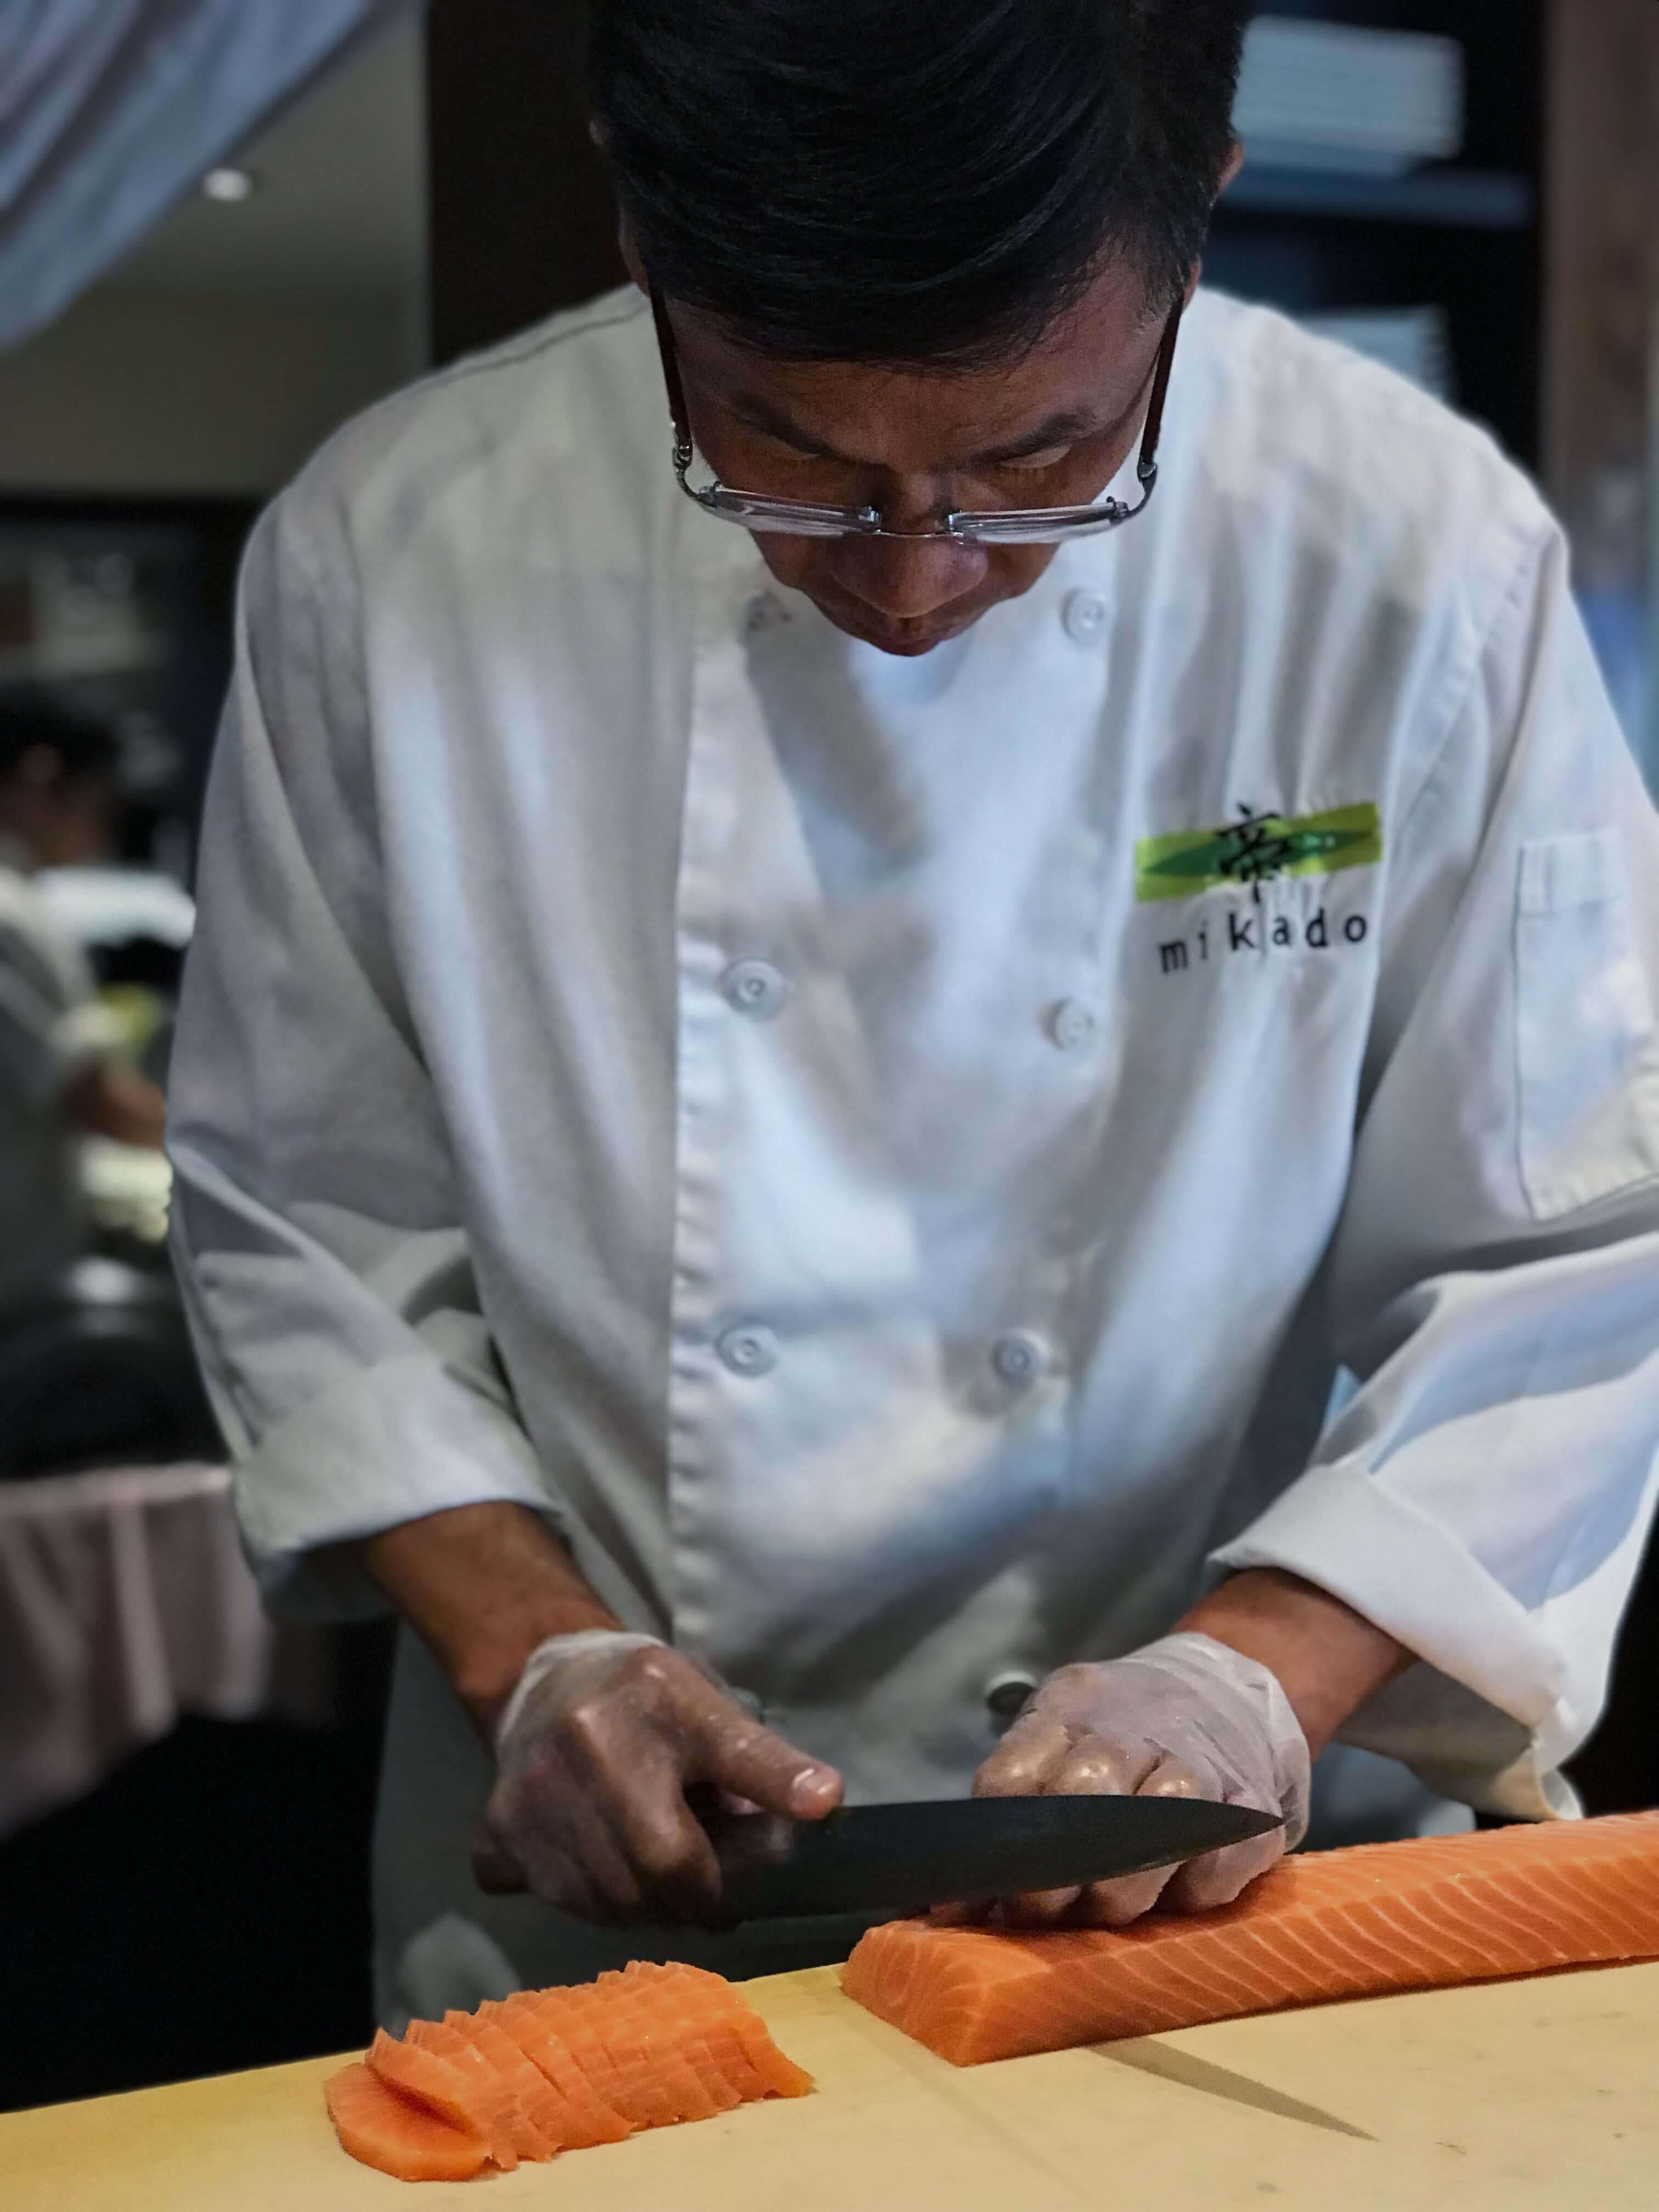 Mikado restaurant sushi laurier monkland montreal